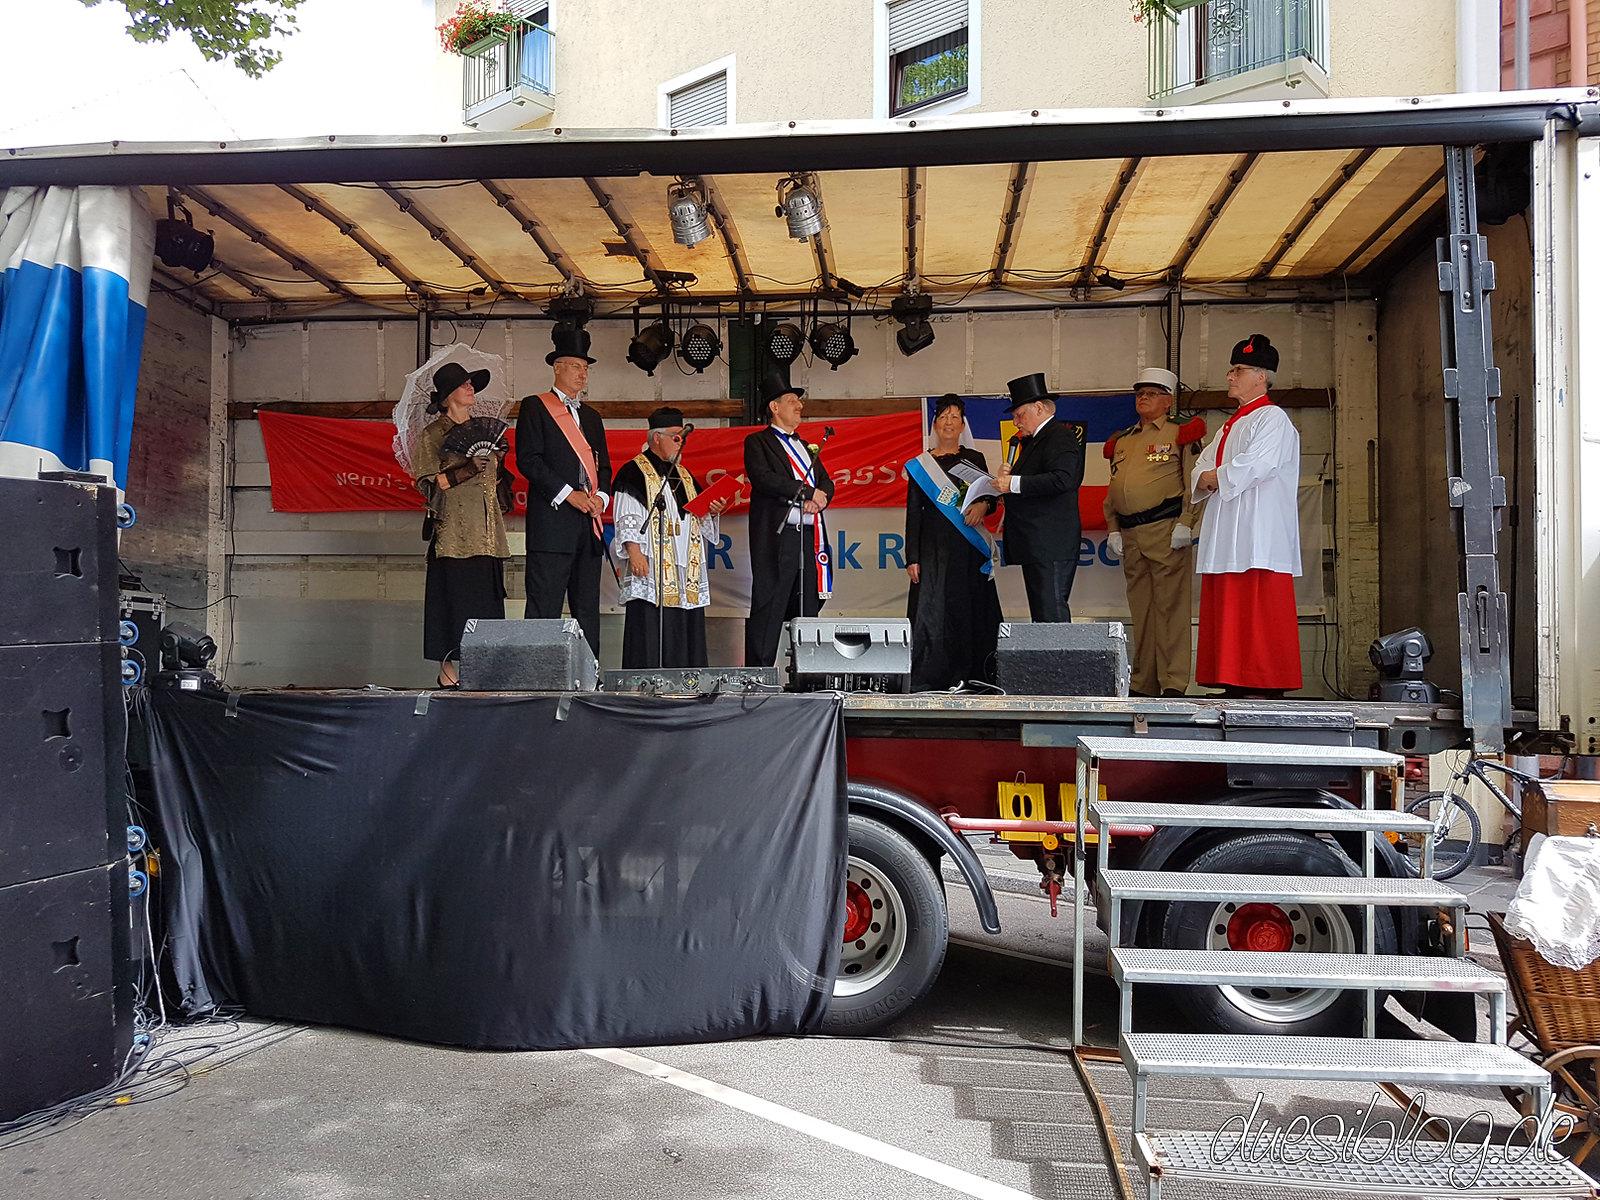 Stadtteilfest Mannheim Neckarau 2017 duesiblog 16